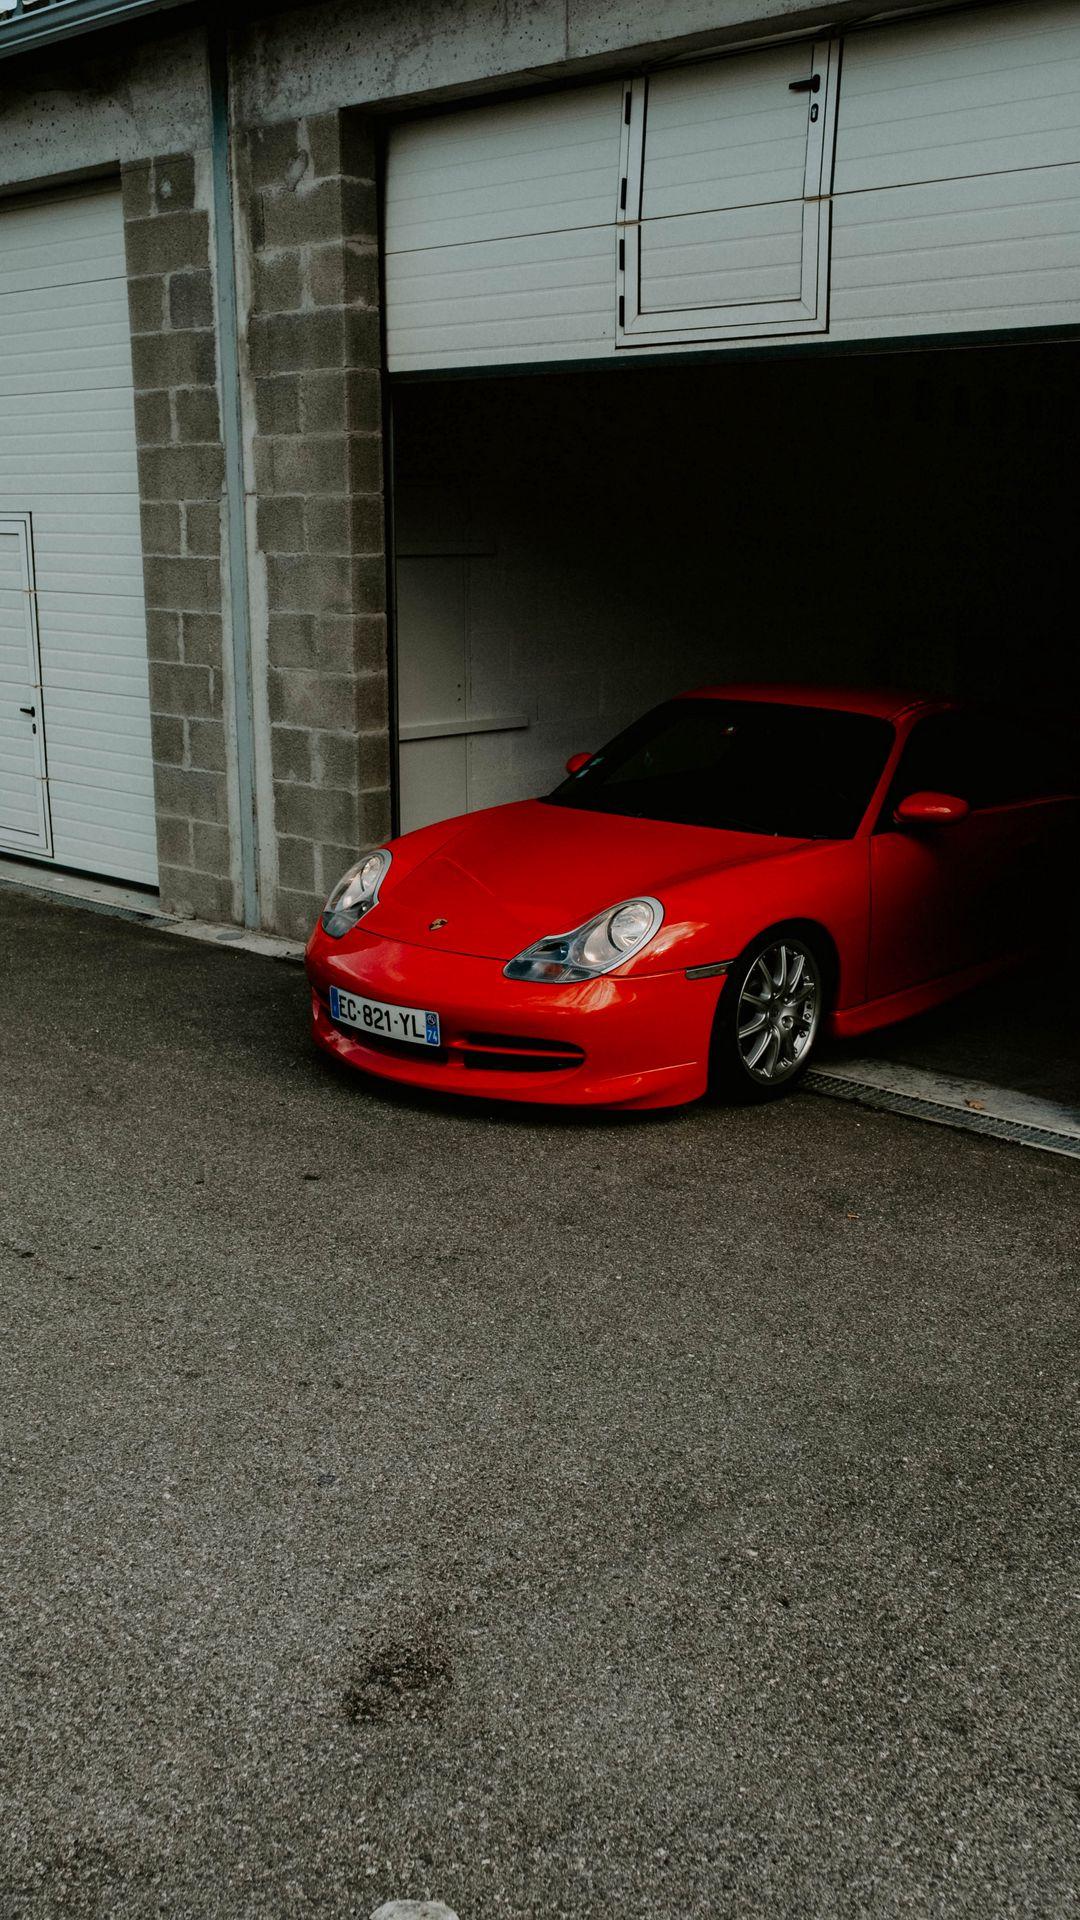 Porsche Retro Red Car Wallpapers Download